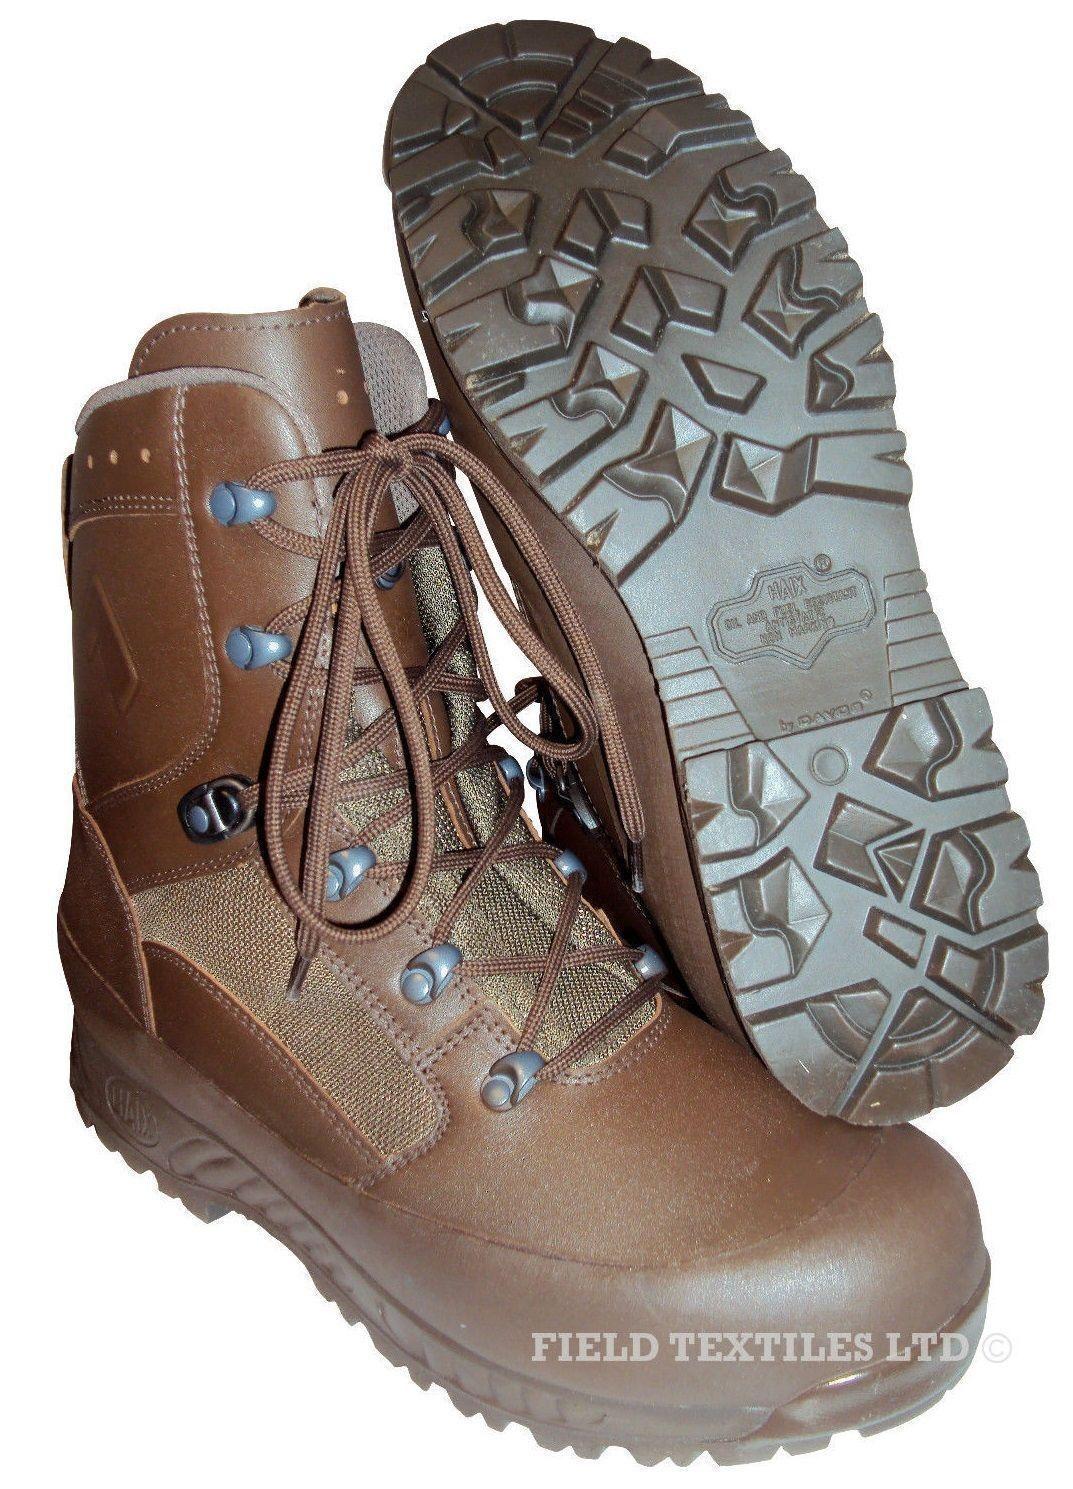 HAIX FEMALE BROWN COMBAT BOOTS - SIZE - 5M - BRAND NEW IN BOX - RL2099 - NBC1